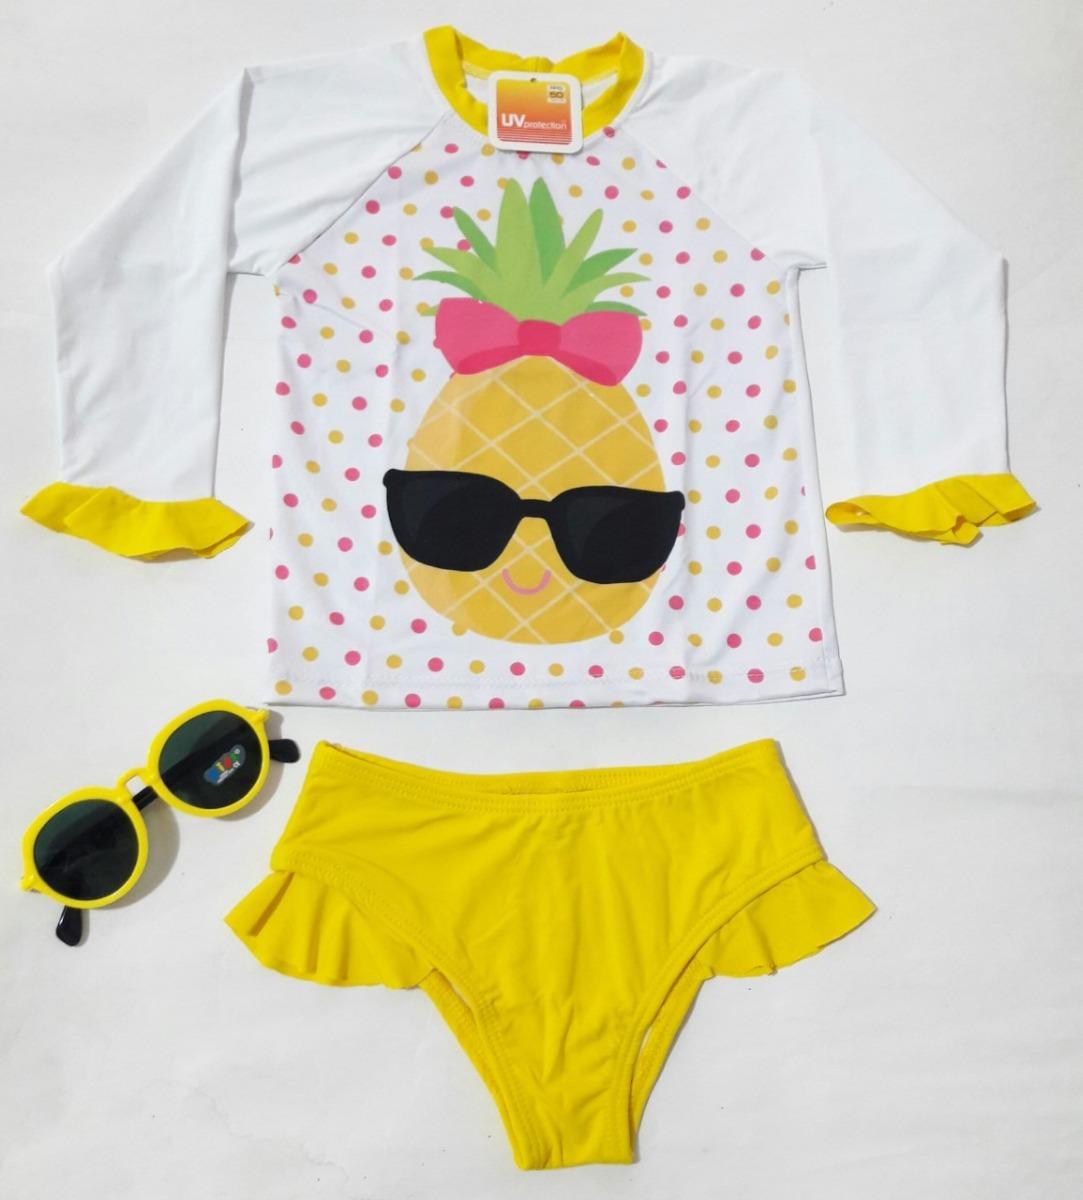 7917e507f Conjunto Menina Camisa Uv Biquíni Uv Infantil Lol Com Óculos - R  69 ...